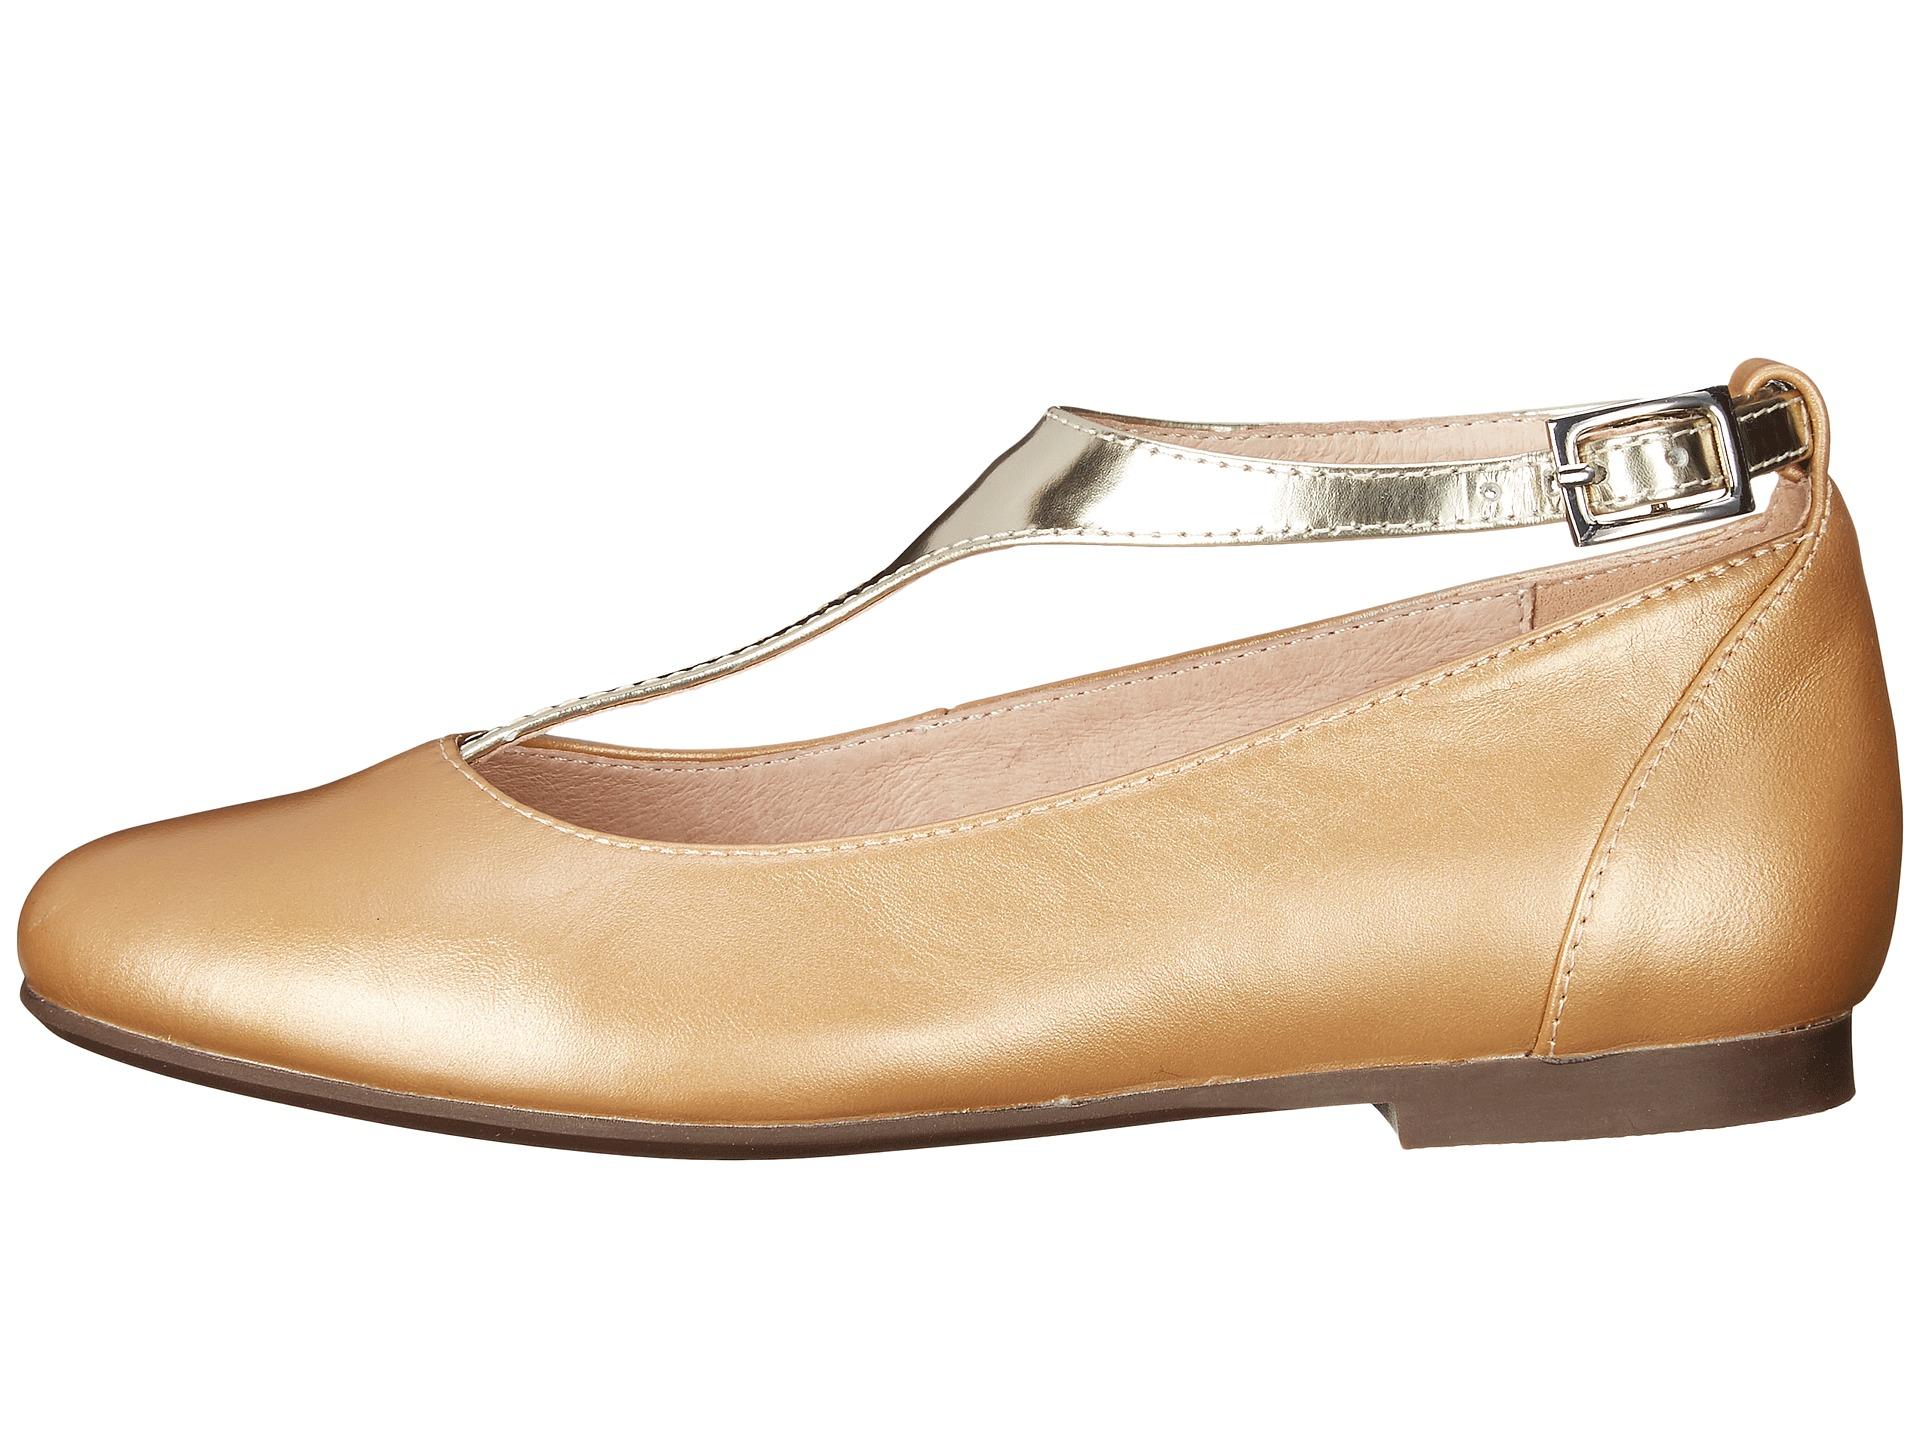 Venettini Shoes Size Chart